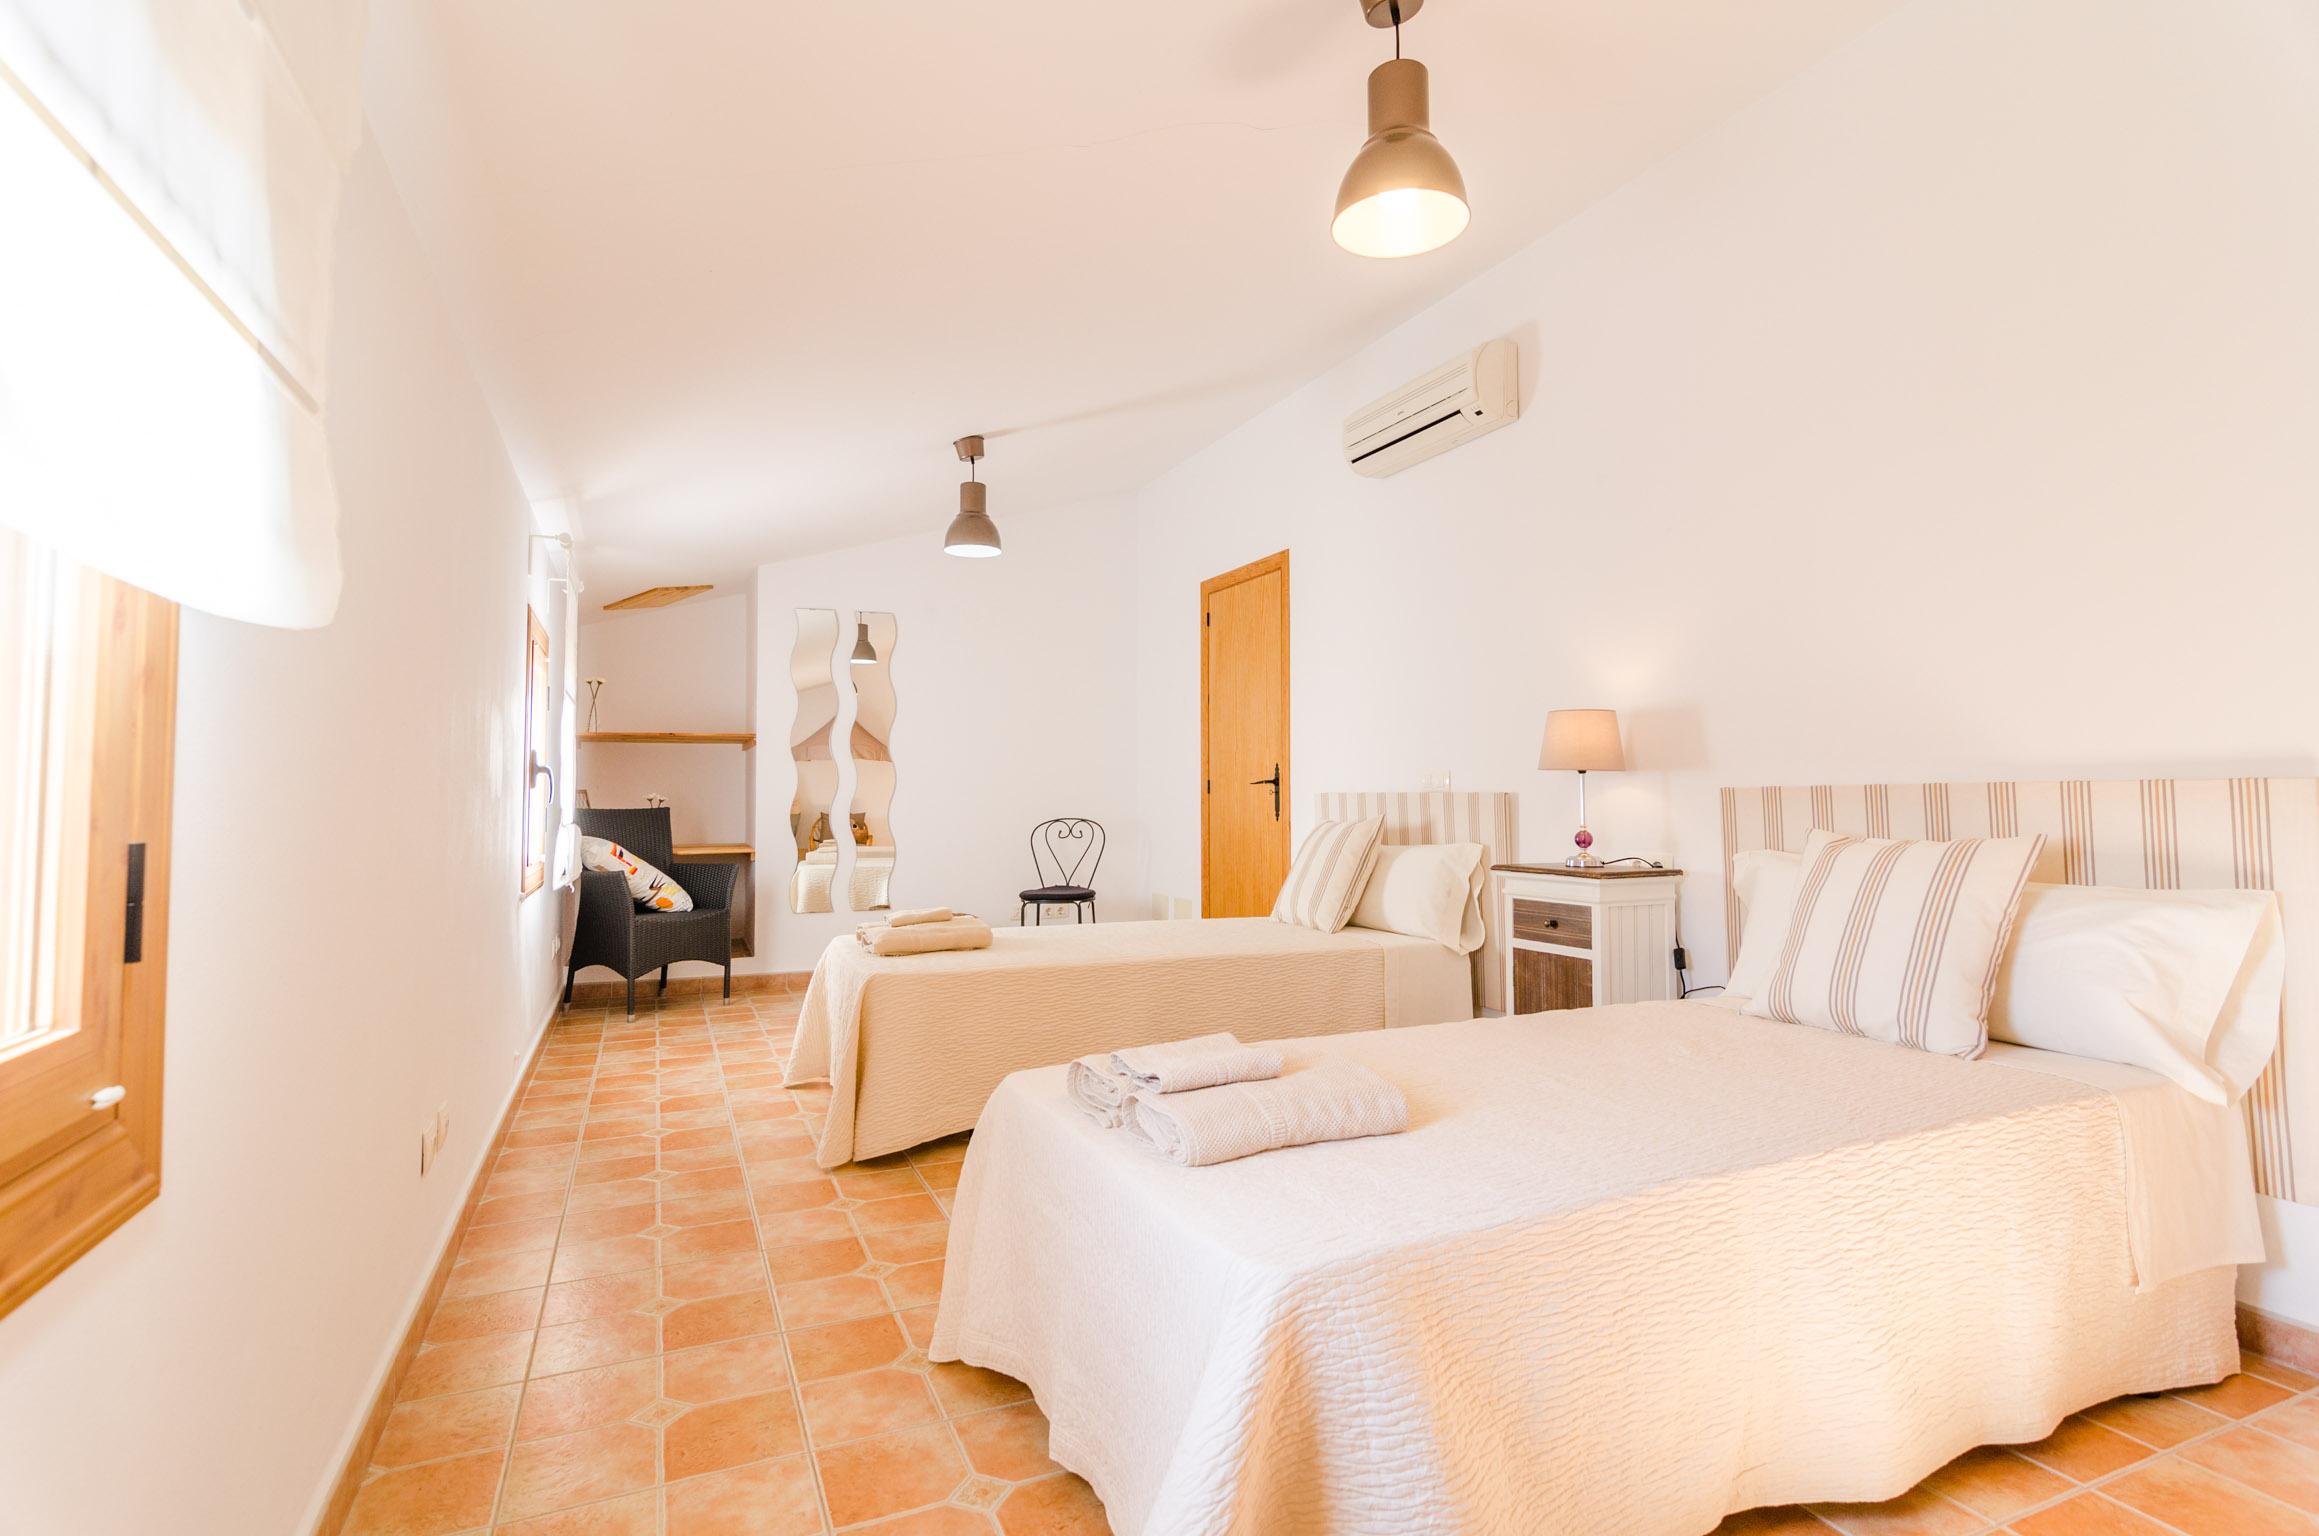 Ferienhaus SANT BLAI VELL (2284789), Campos, Mallorca, Balearische Inseln, Spanien, Bild 18